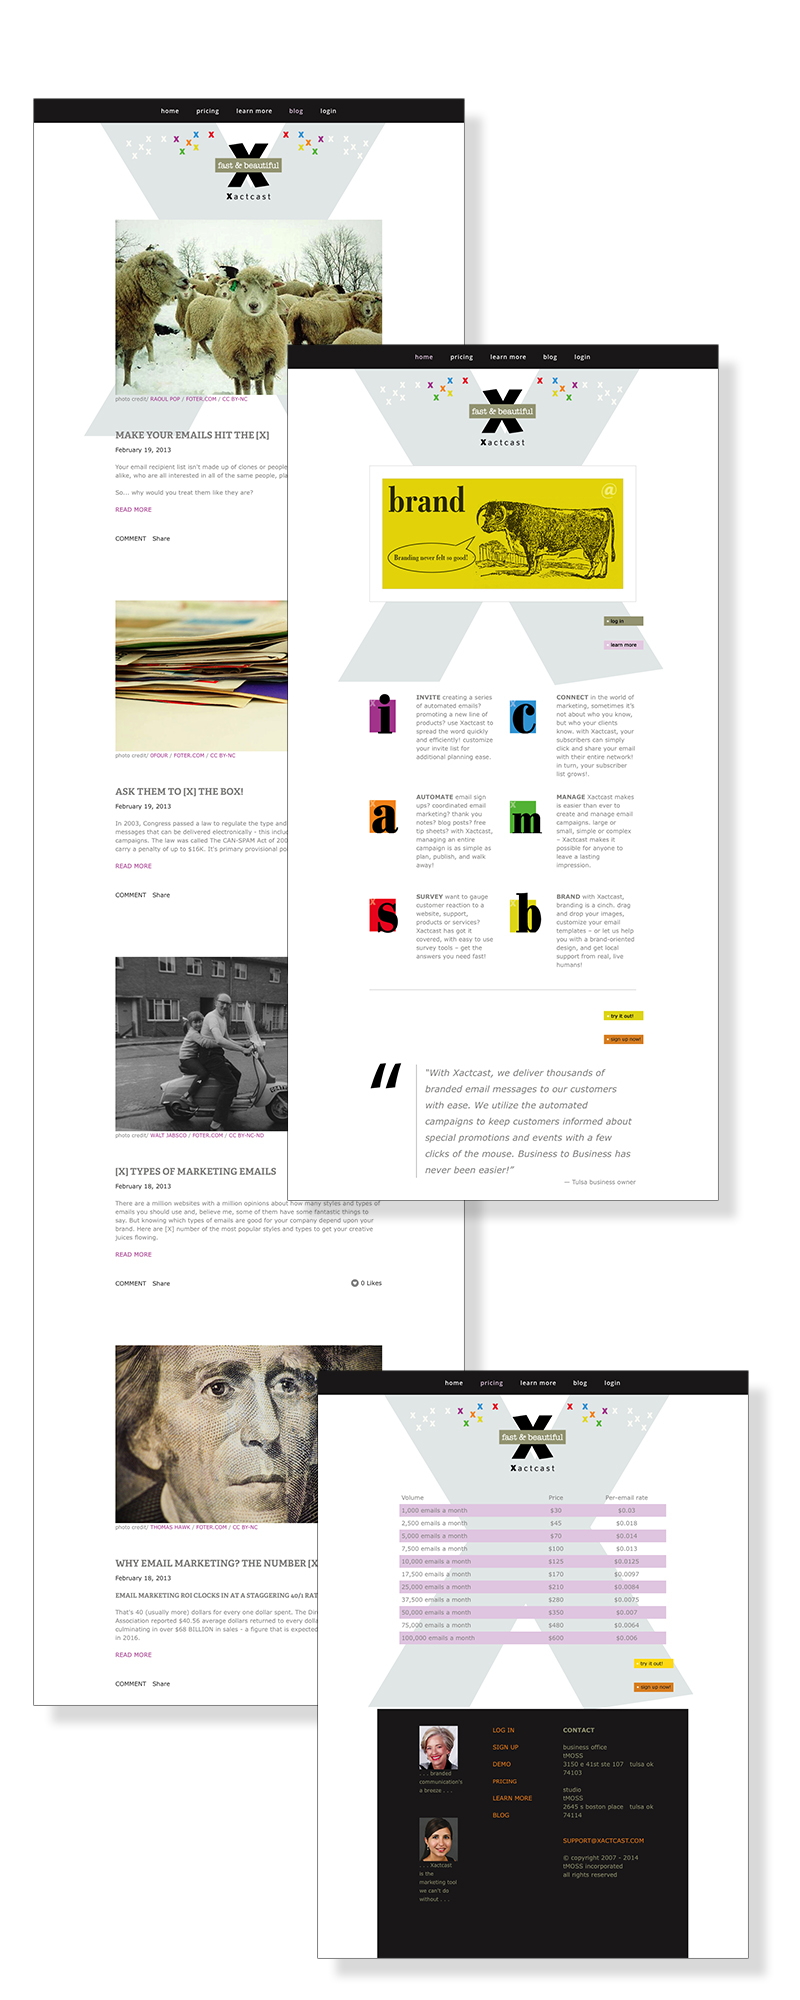 xactcast-pages-tmoss-portfolio.jpg